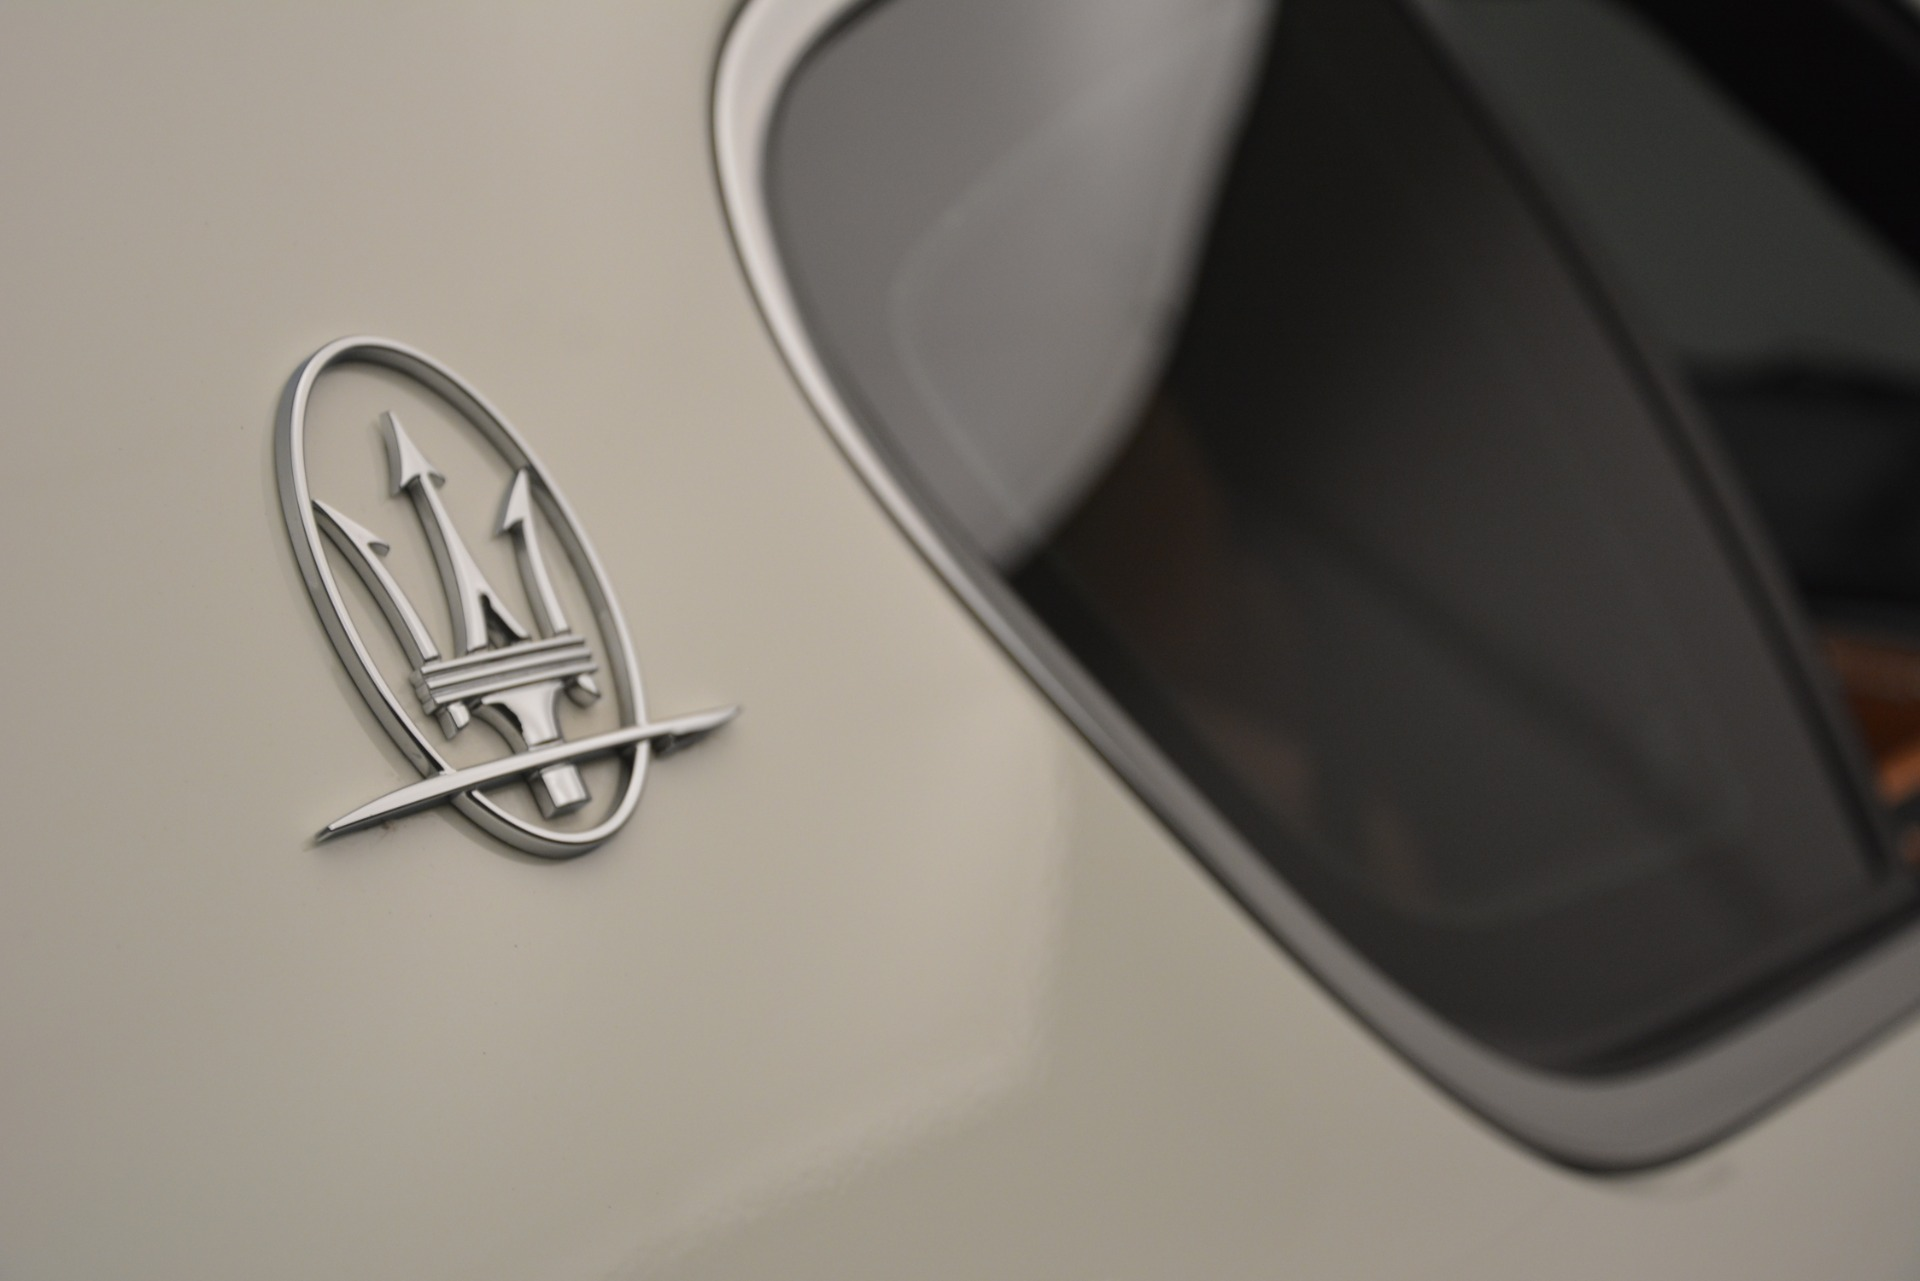 Used 2011 Maserati GranTurismo S Automatic For Sale In Westport, CT 3061_p26